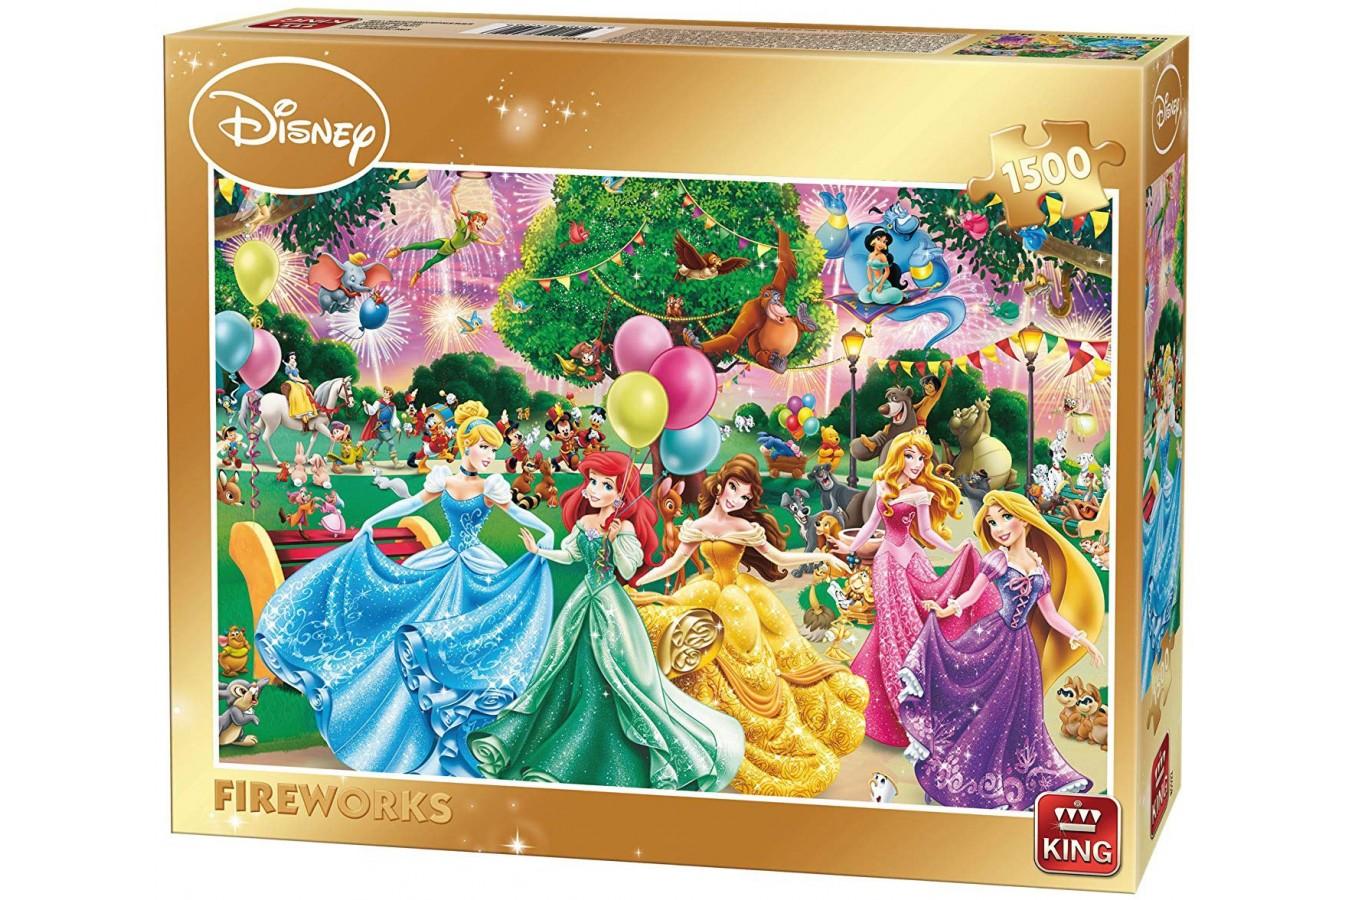 Puzzle Disney Fireworks 1500 tk